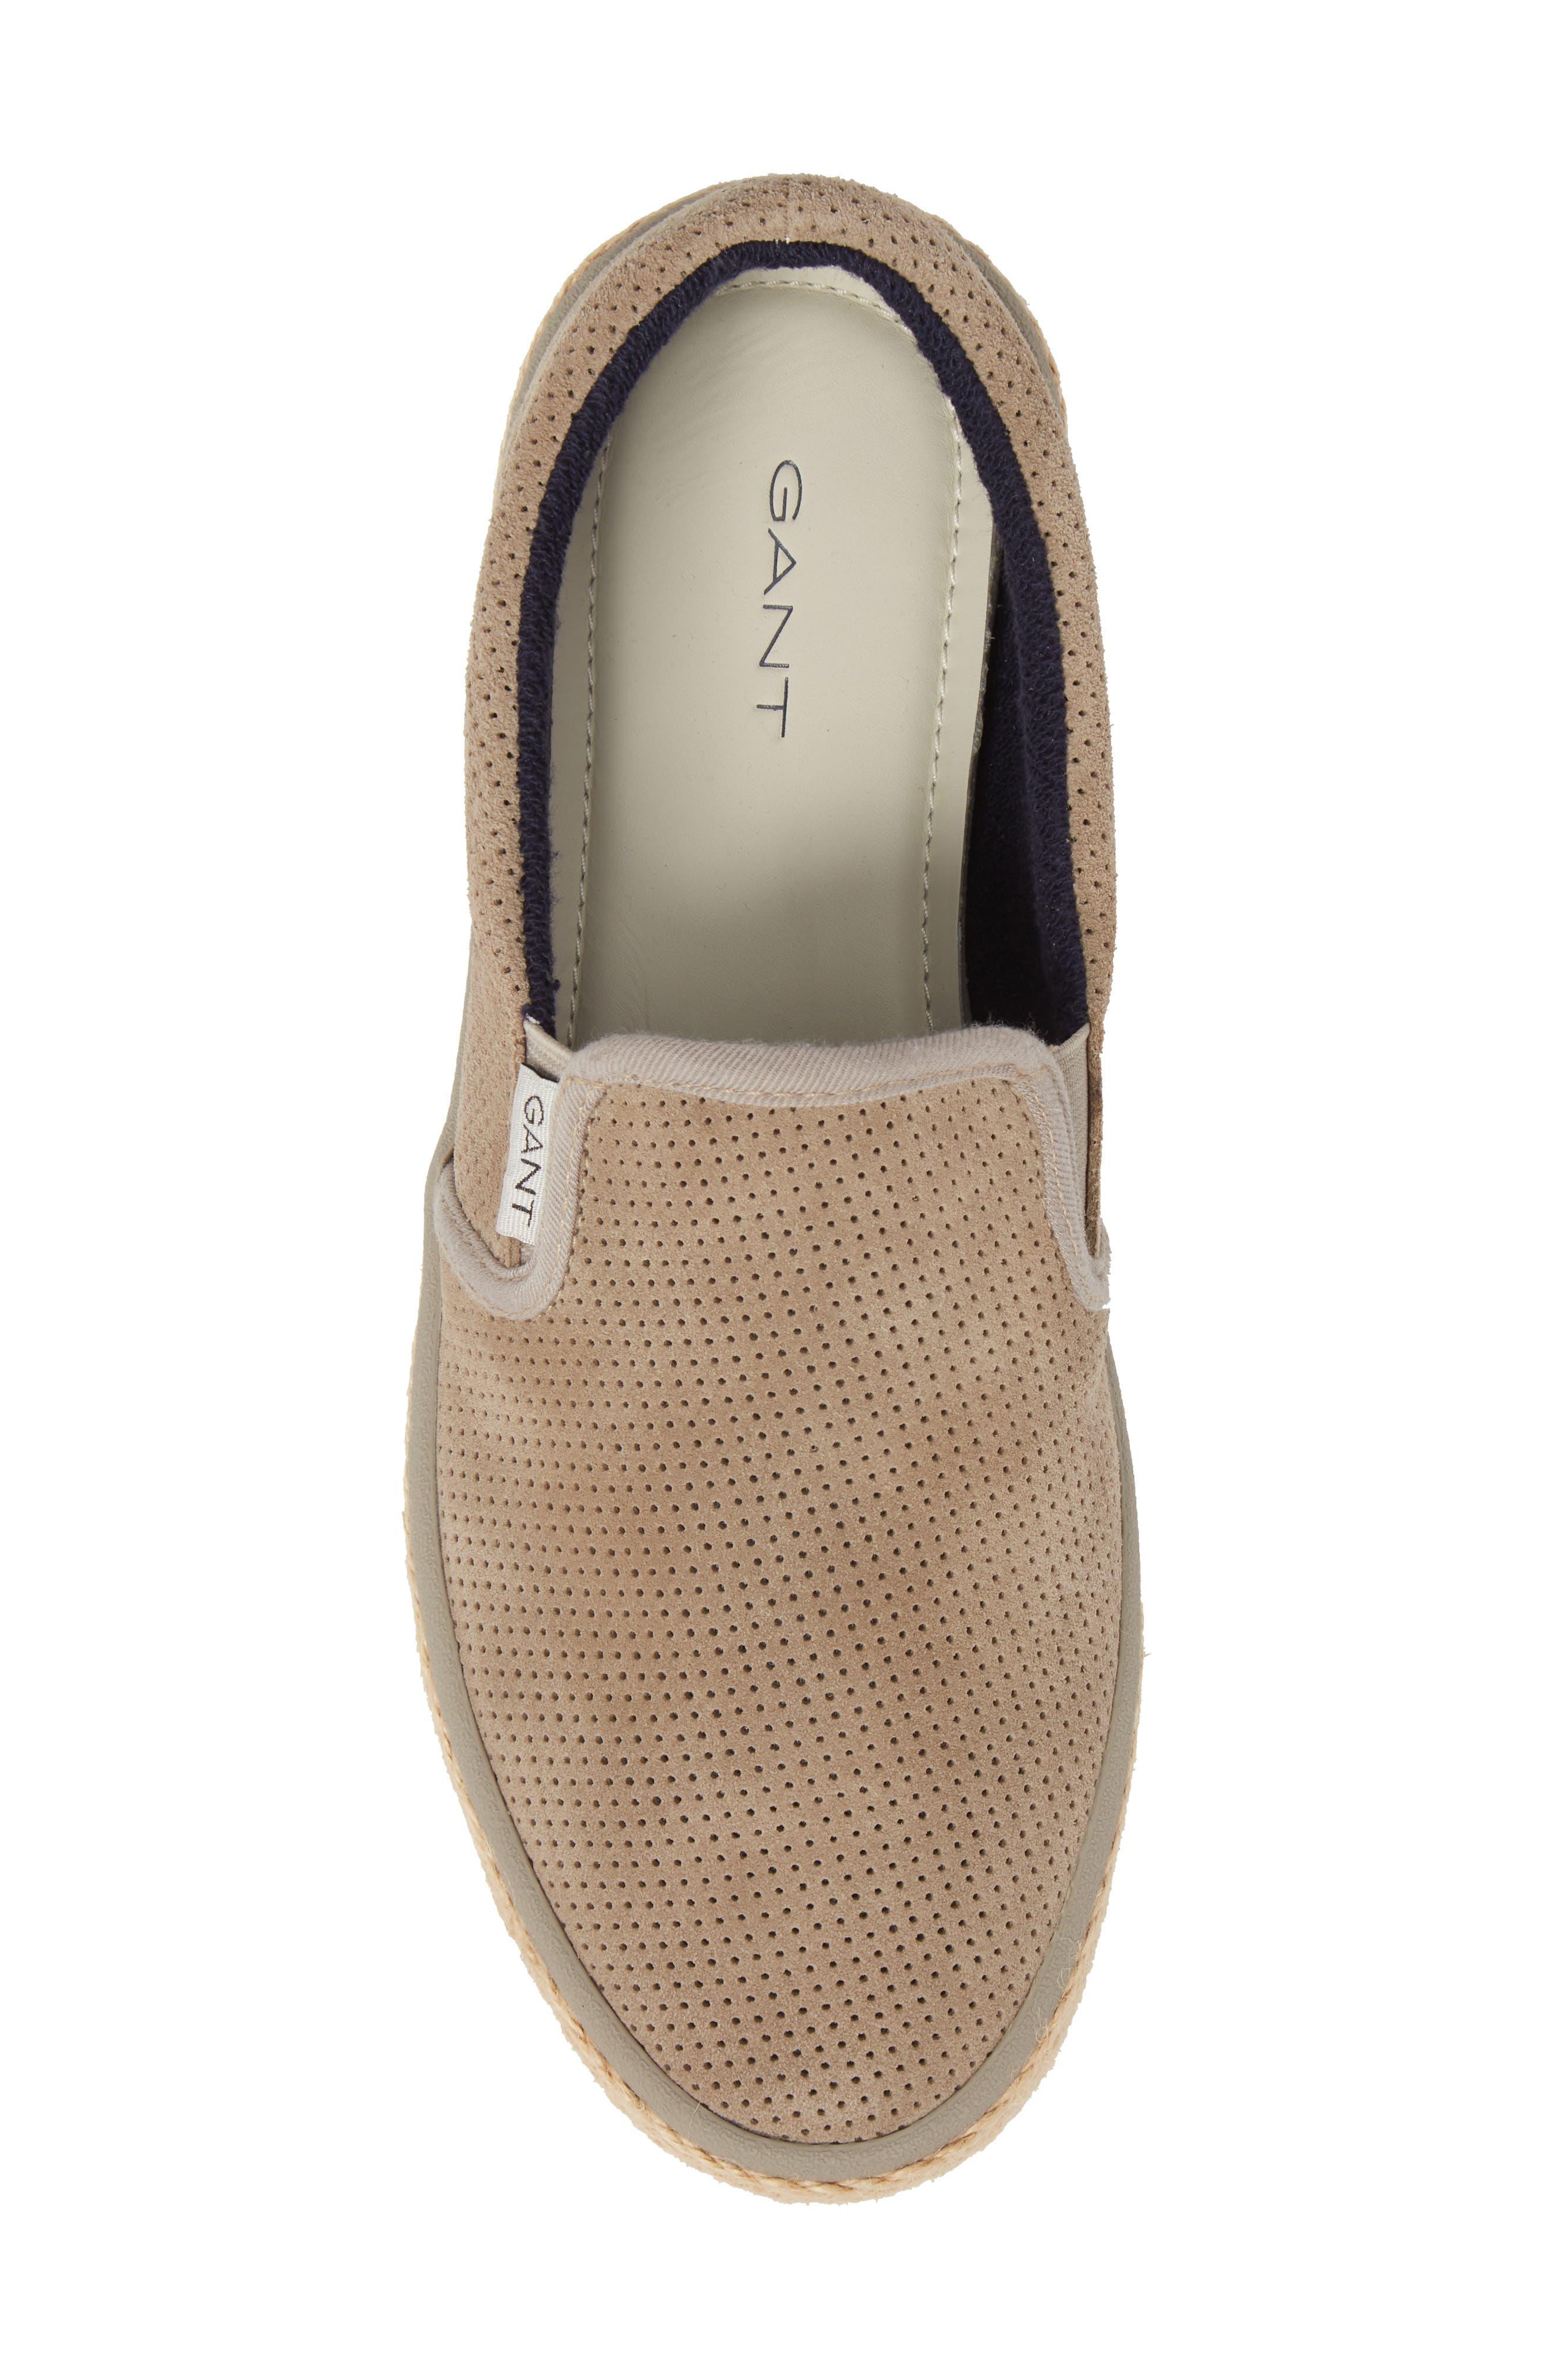 Master Perforated Slip-On Sneaker,                             Alternate thumbnail 5, color,                             209